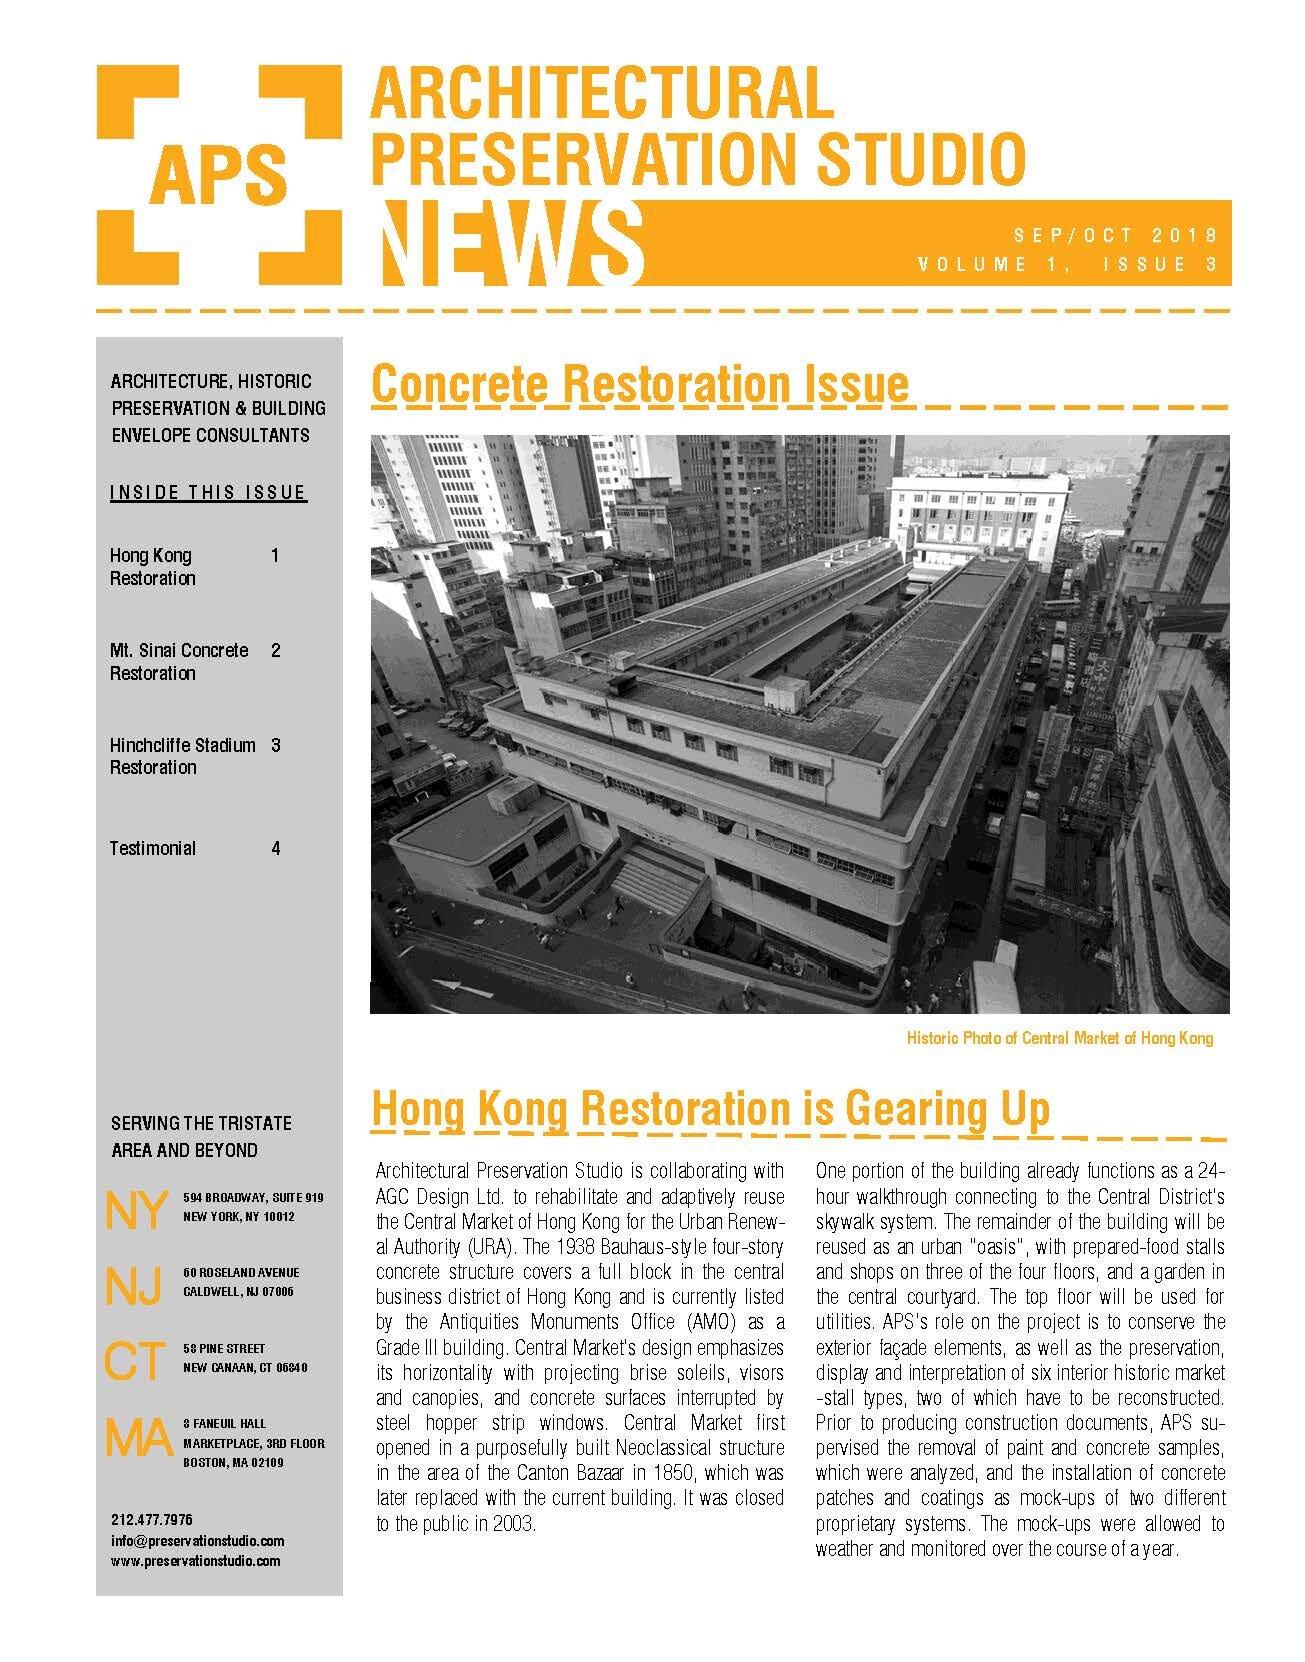 03_ASPS Newsletter-Oct 2018_Page_1.jpg